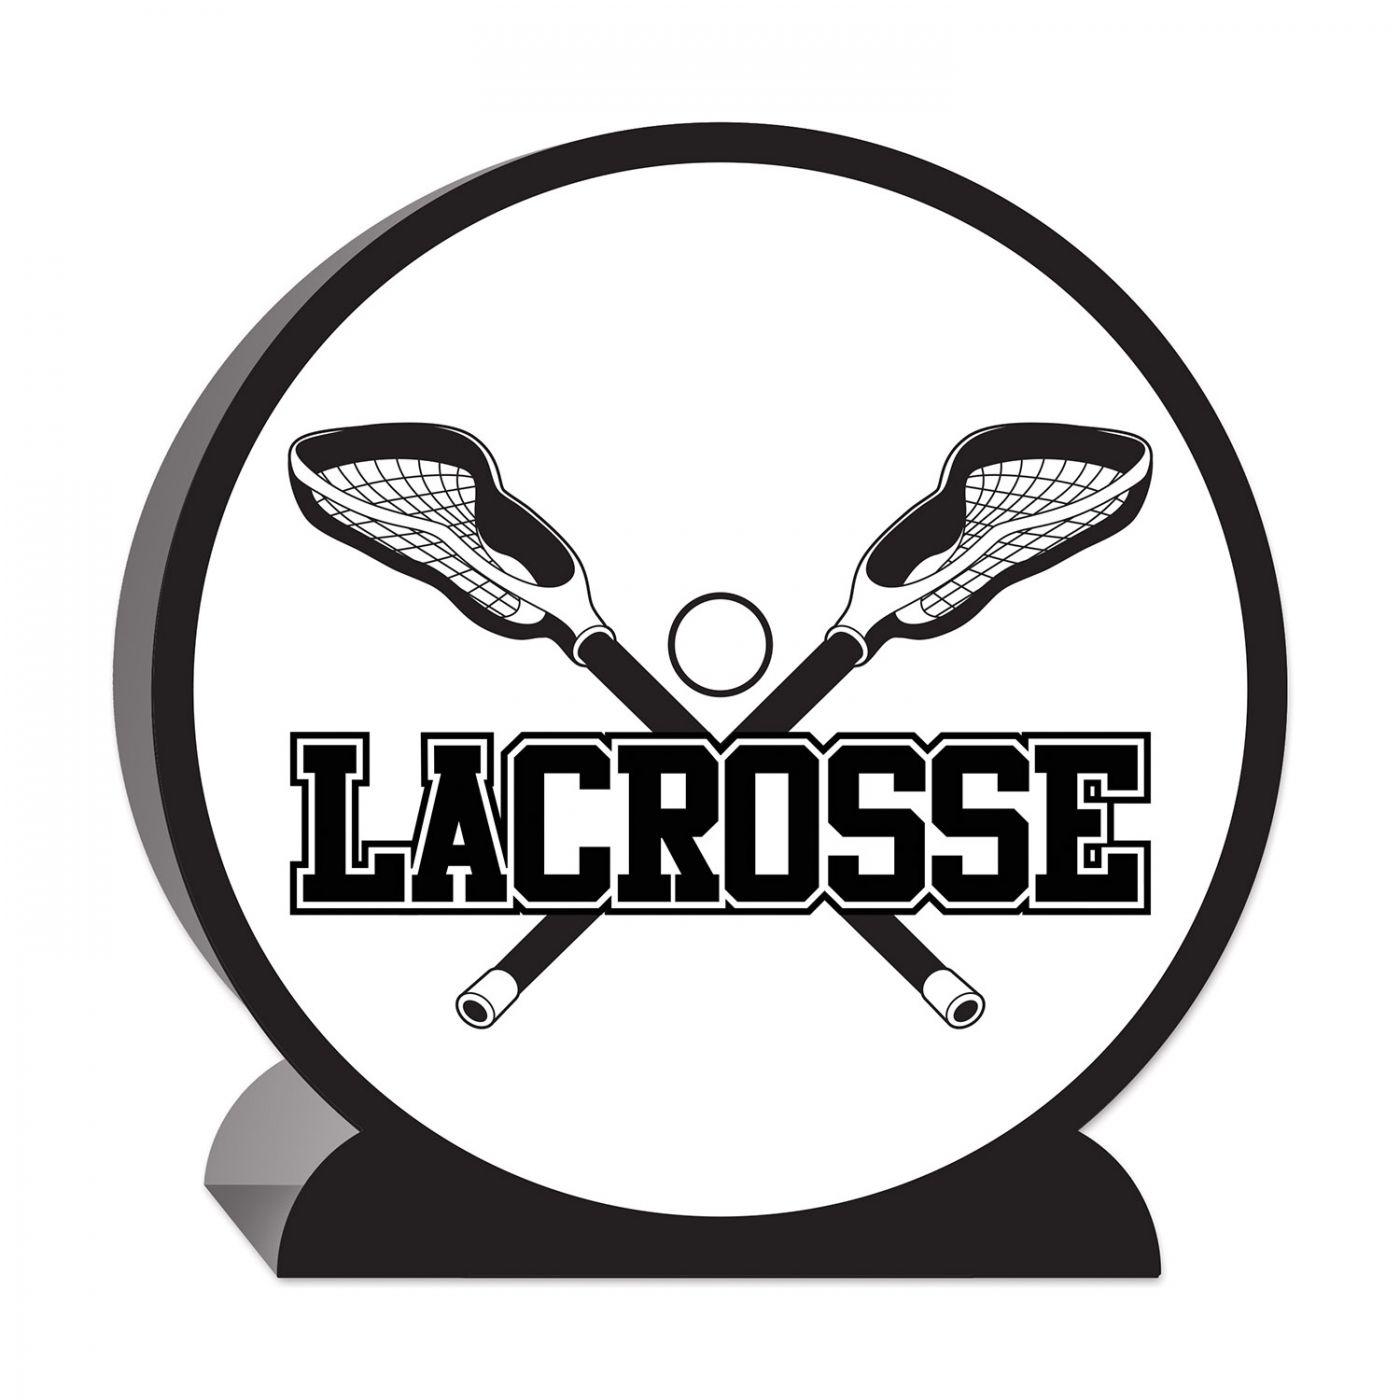 Image of 3-D Lacrosse Centerpiece